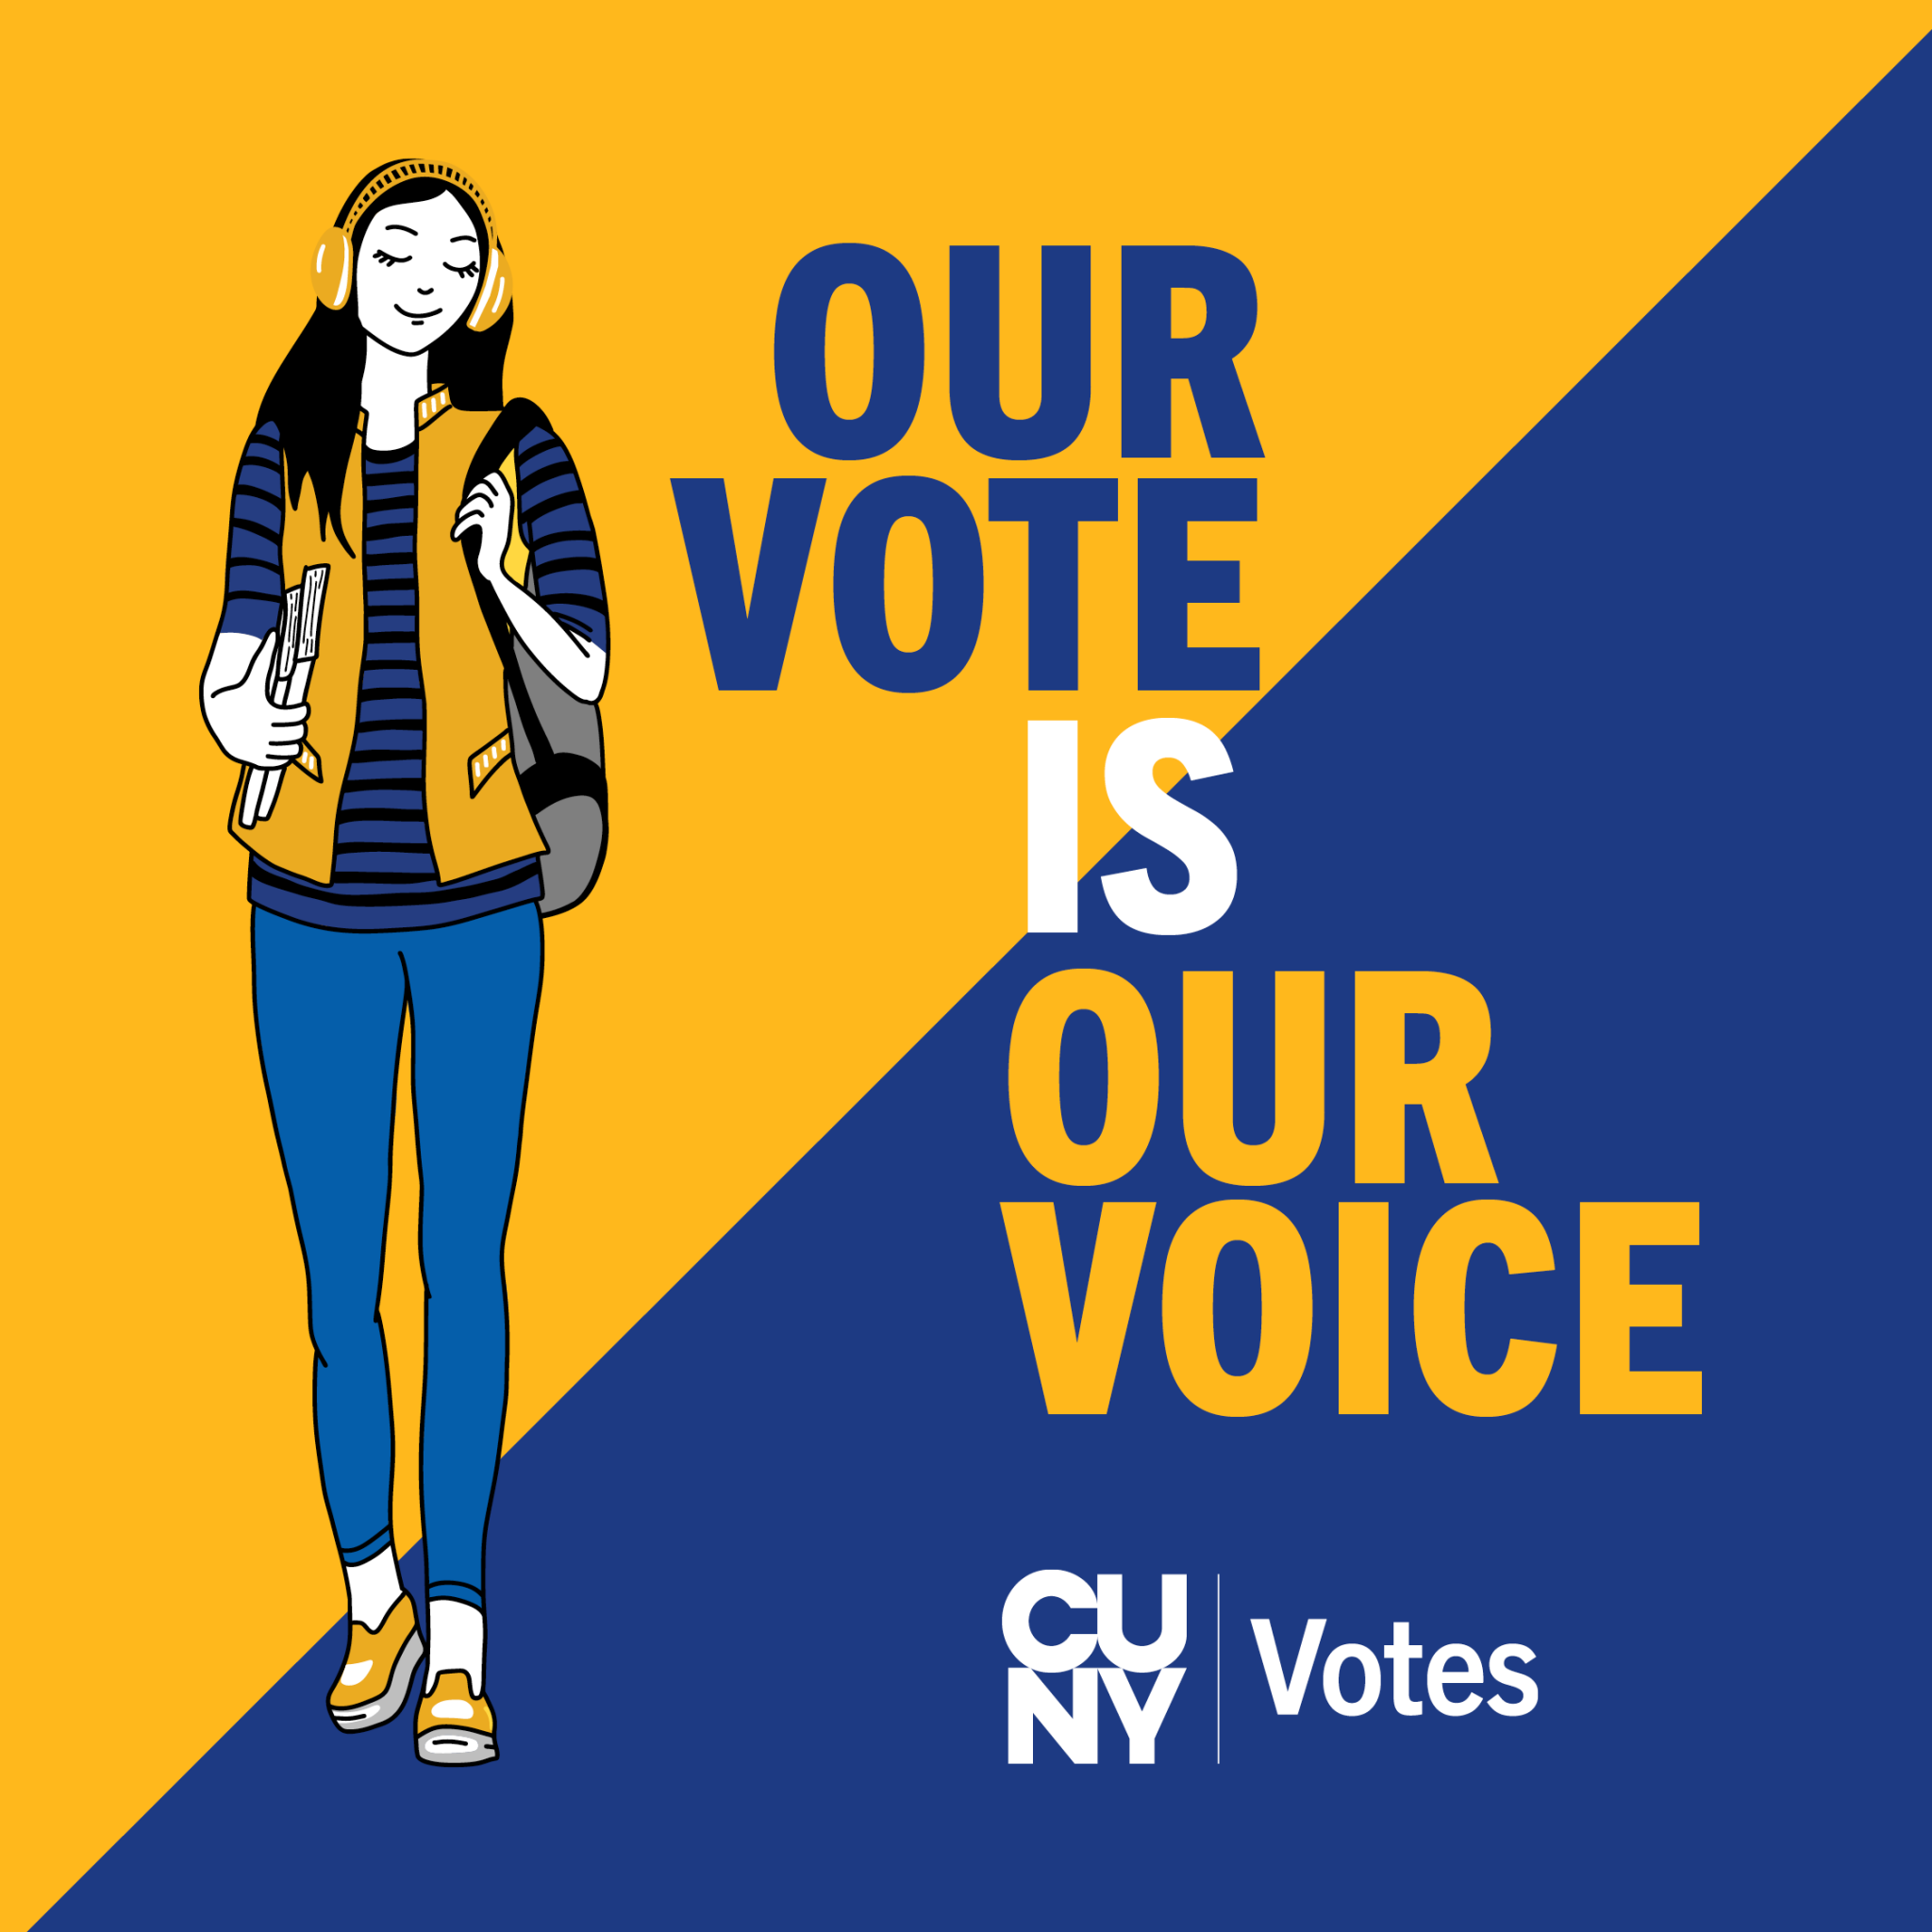 CUNY voting logo